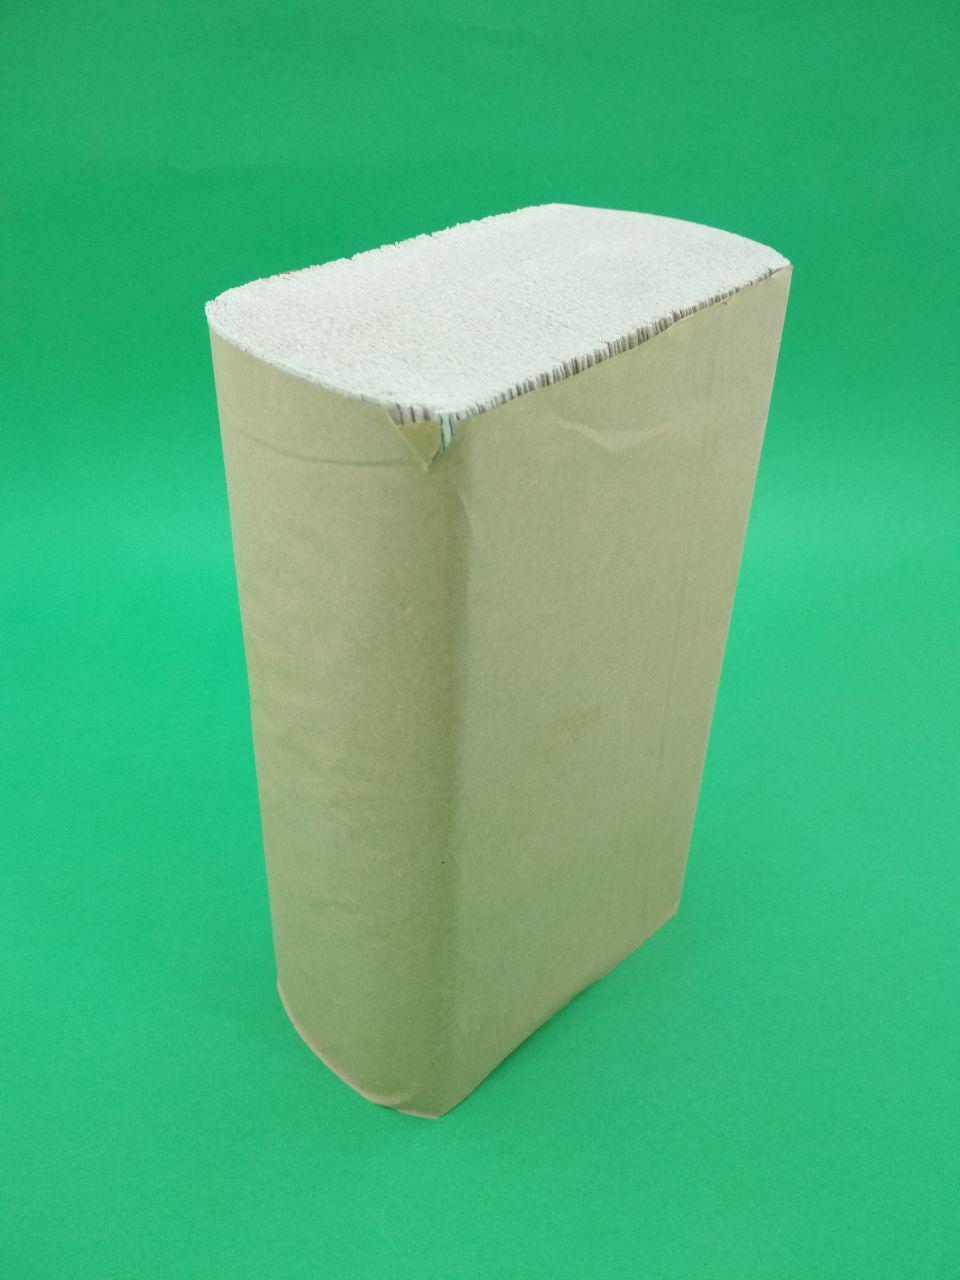 Бумажное полотенце ZZ серое(220*230) Каховинка (1 пач)